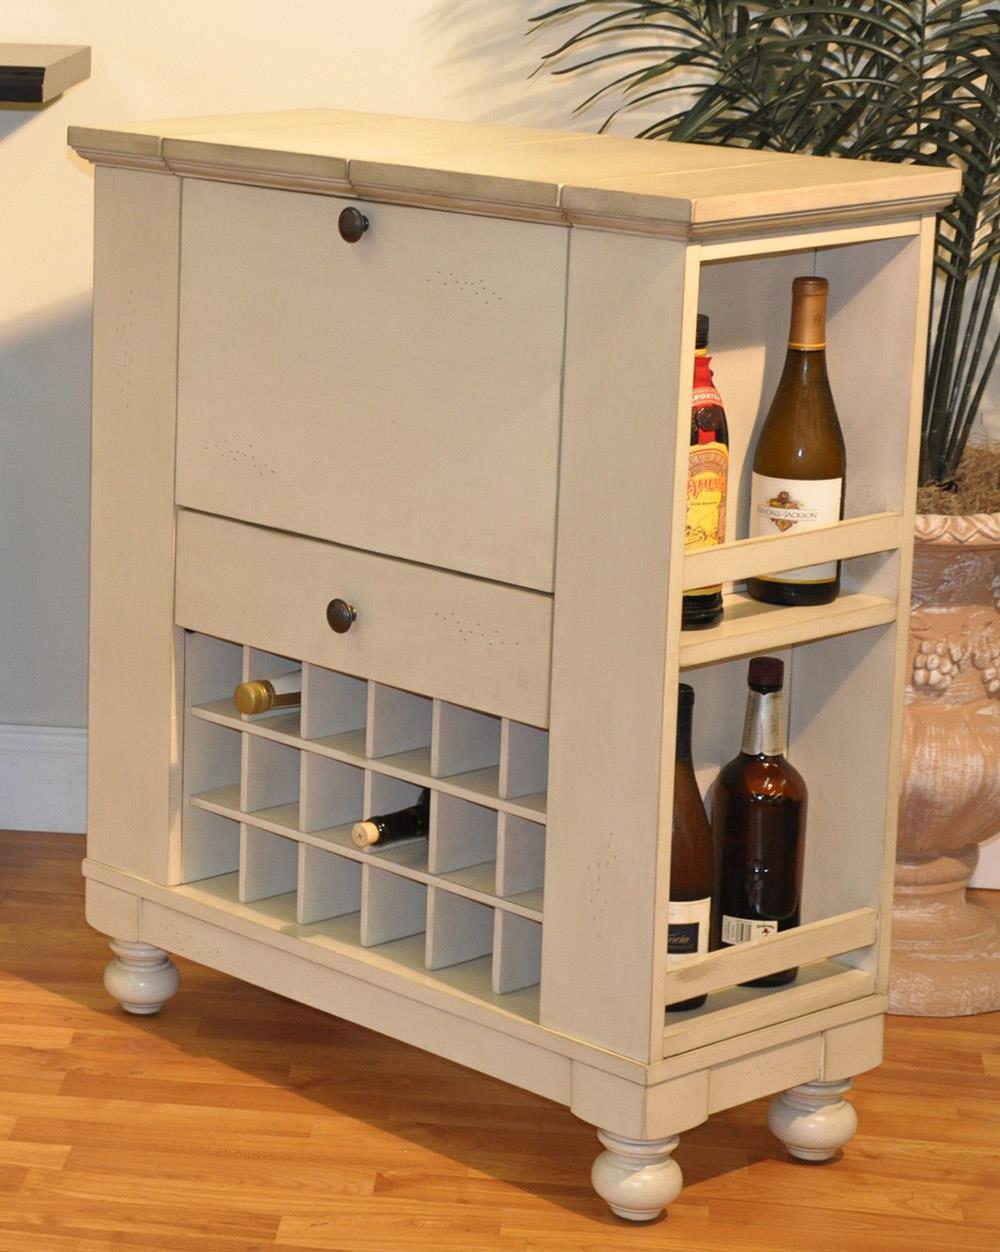 E.C.I. Furniture Dining  Wine/Spirit Cabinet: Antique White - Item Number: 1866-20-WB